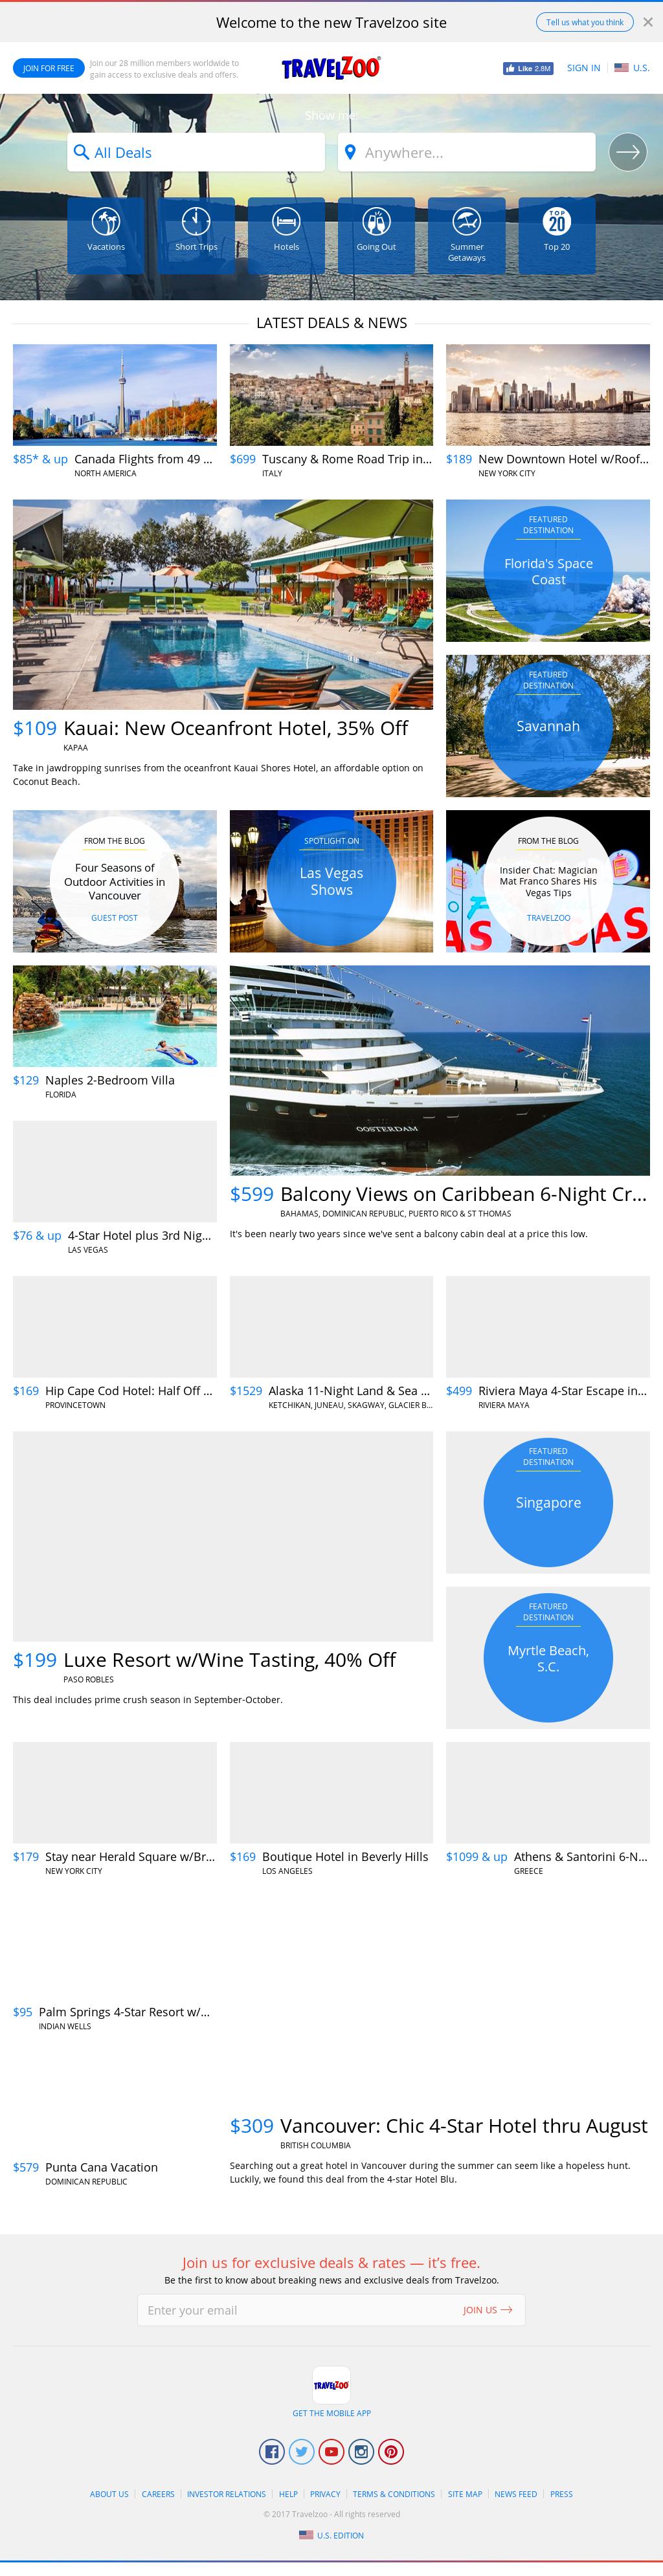 75ad4c34f5 Travelzoo Competitors, Revenue and Employees - Owler Company Profile